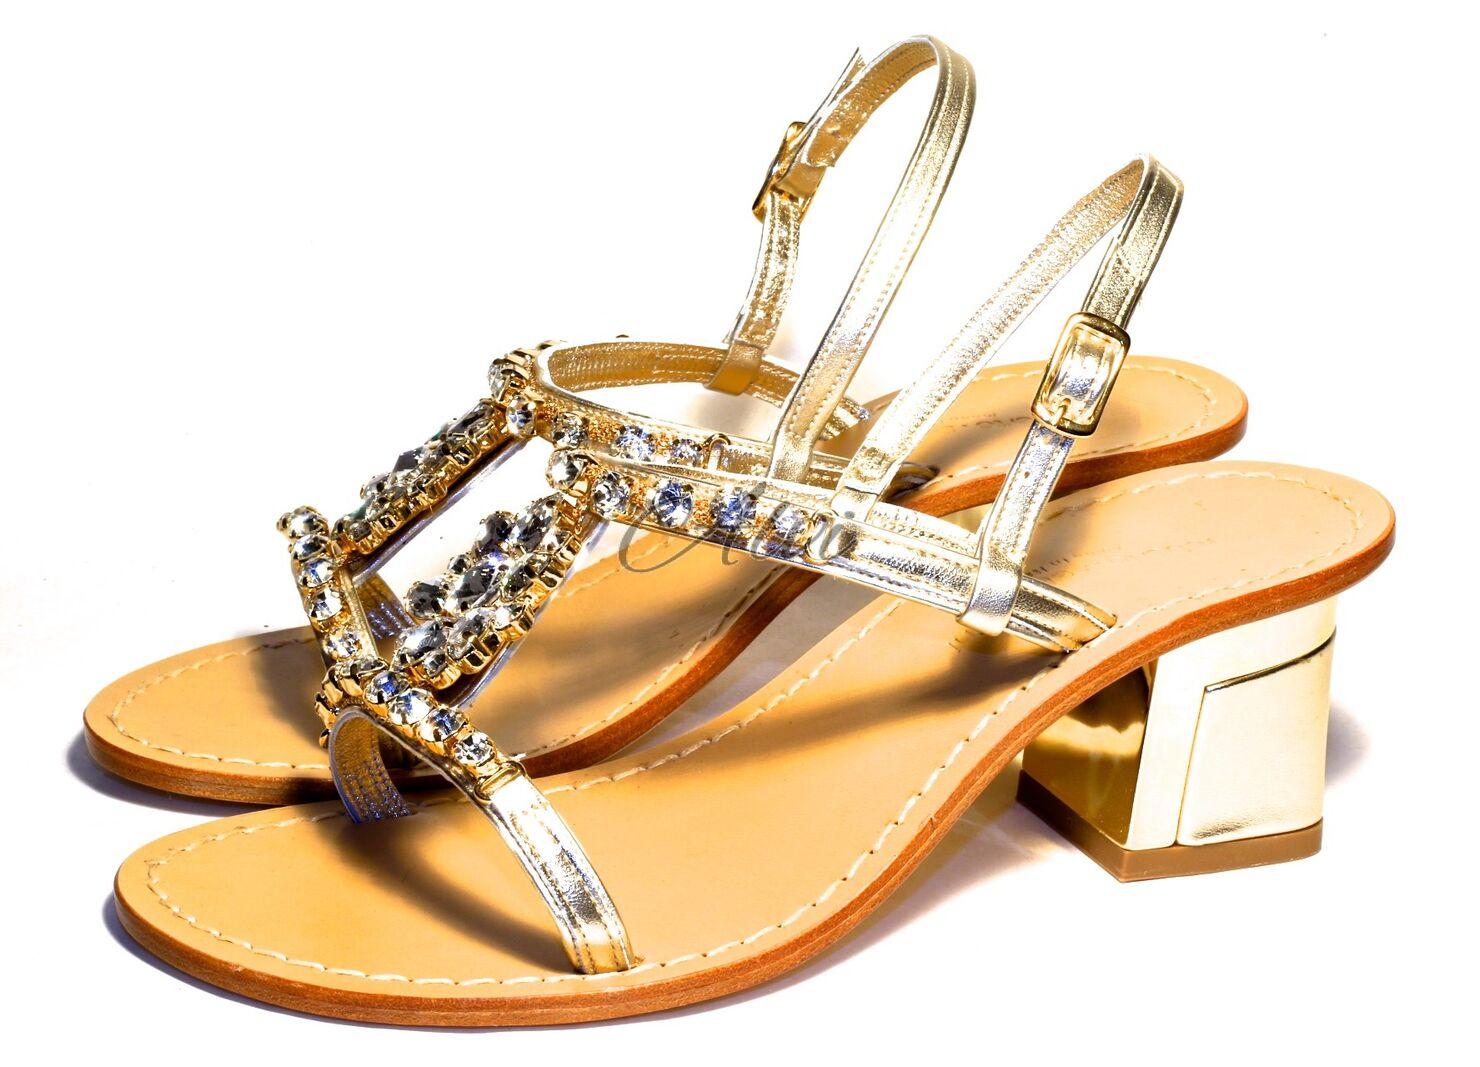 Eleganti Platino Eleganti Platino Maxi Fiore Maxi Fiore Sandali Platino Sandali Sandali Eleganti pSUVqzM